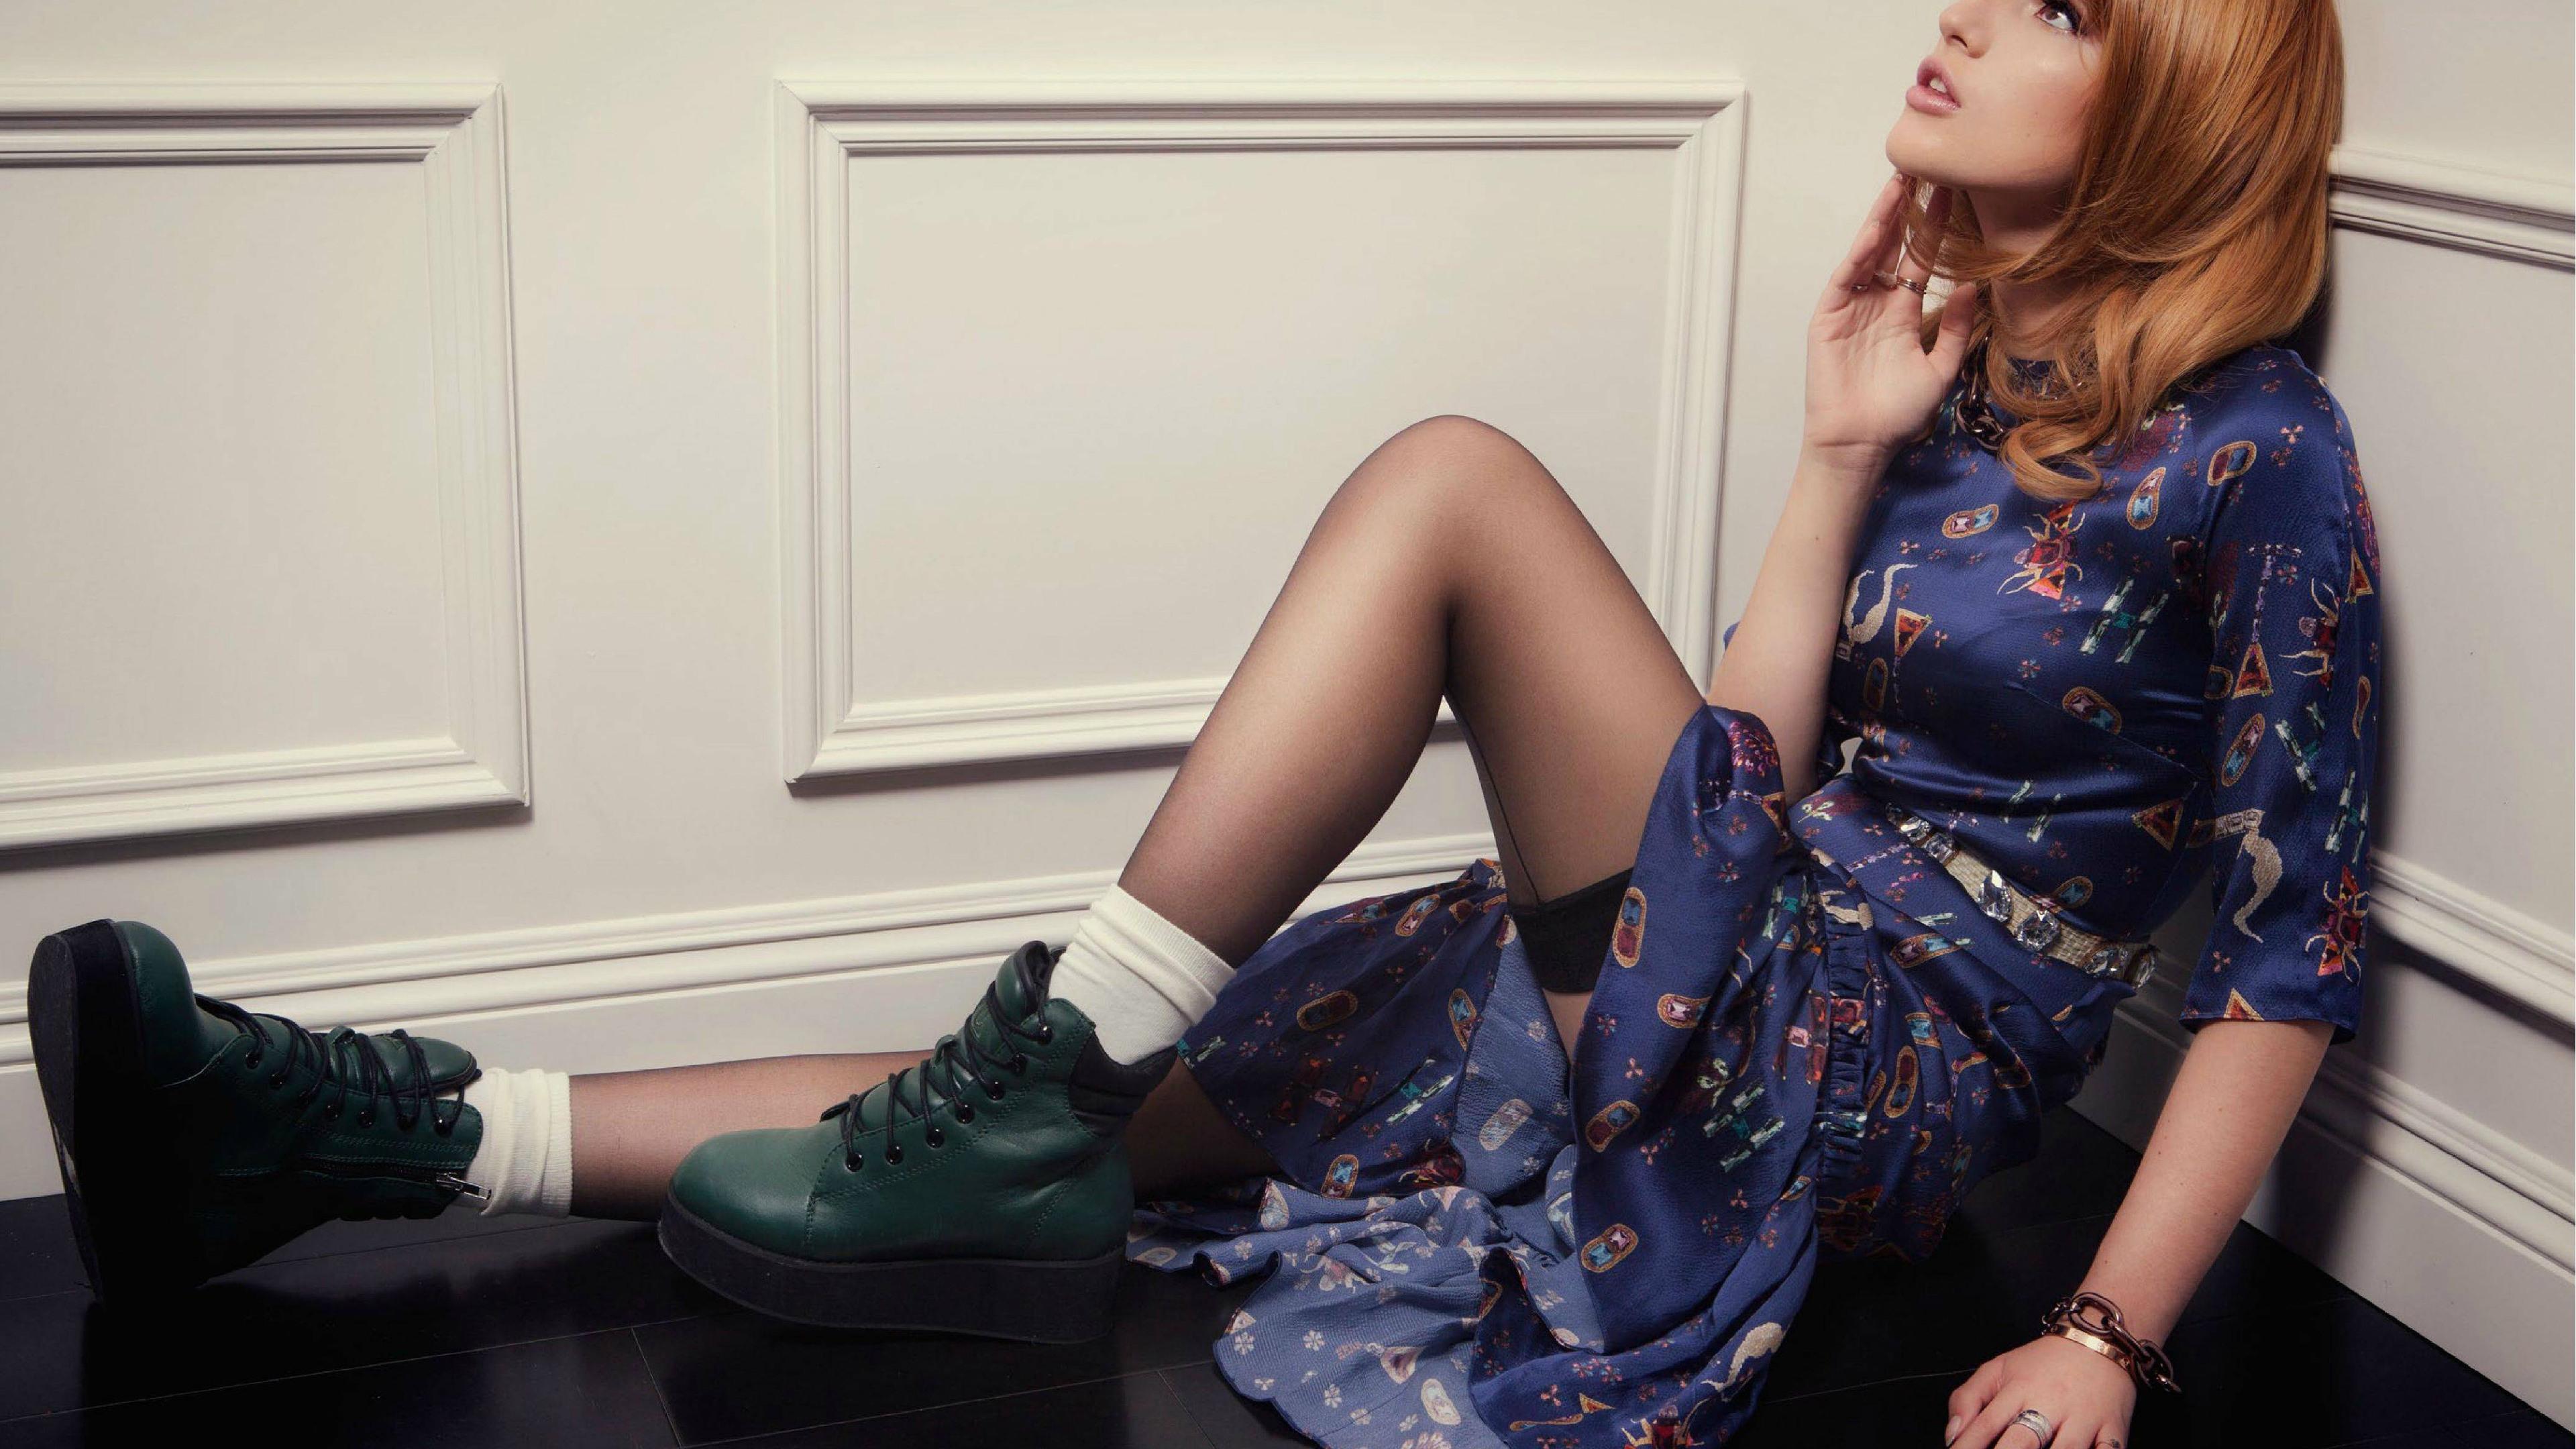 bella thorne 4k 2017 1536860097 - Bella Thorne 4k 2017 - hd-wallpapers, girls wallpapers, celebrities wallpapers, bella thorne wallpapers, 4k-wallpapers